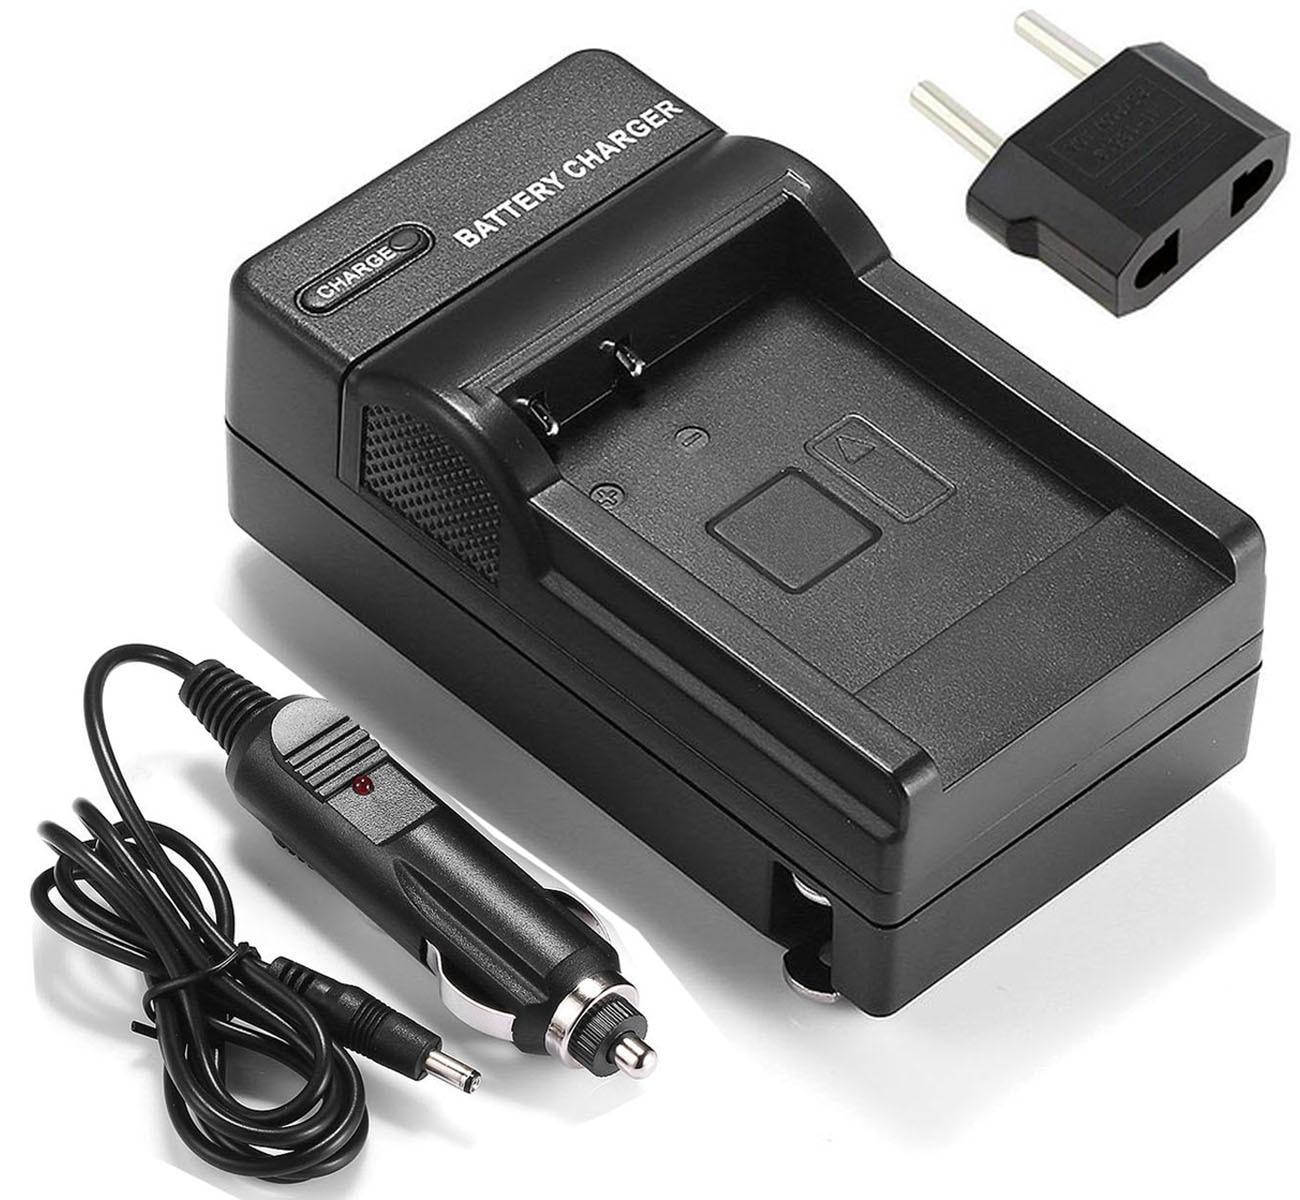 Carregador de Bateria para Sanyo Dbl50 e Sanyo Xacti Vpc-hd1000 Vpc-hd1010 Vpc-hd2000 Filmadora Db-l50 Vpc-fh1 Vpc-th1 Vpc-wh1